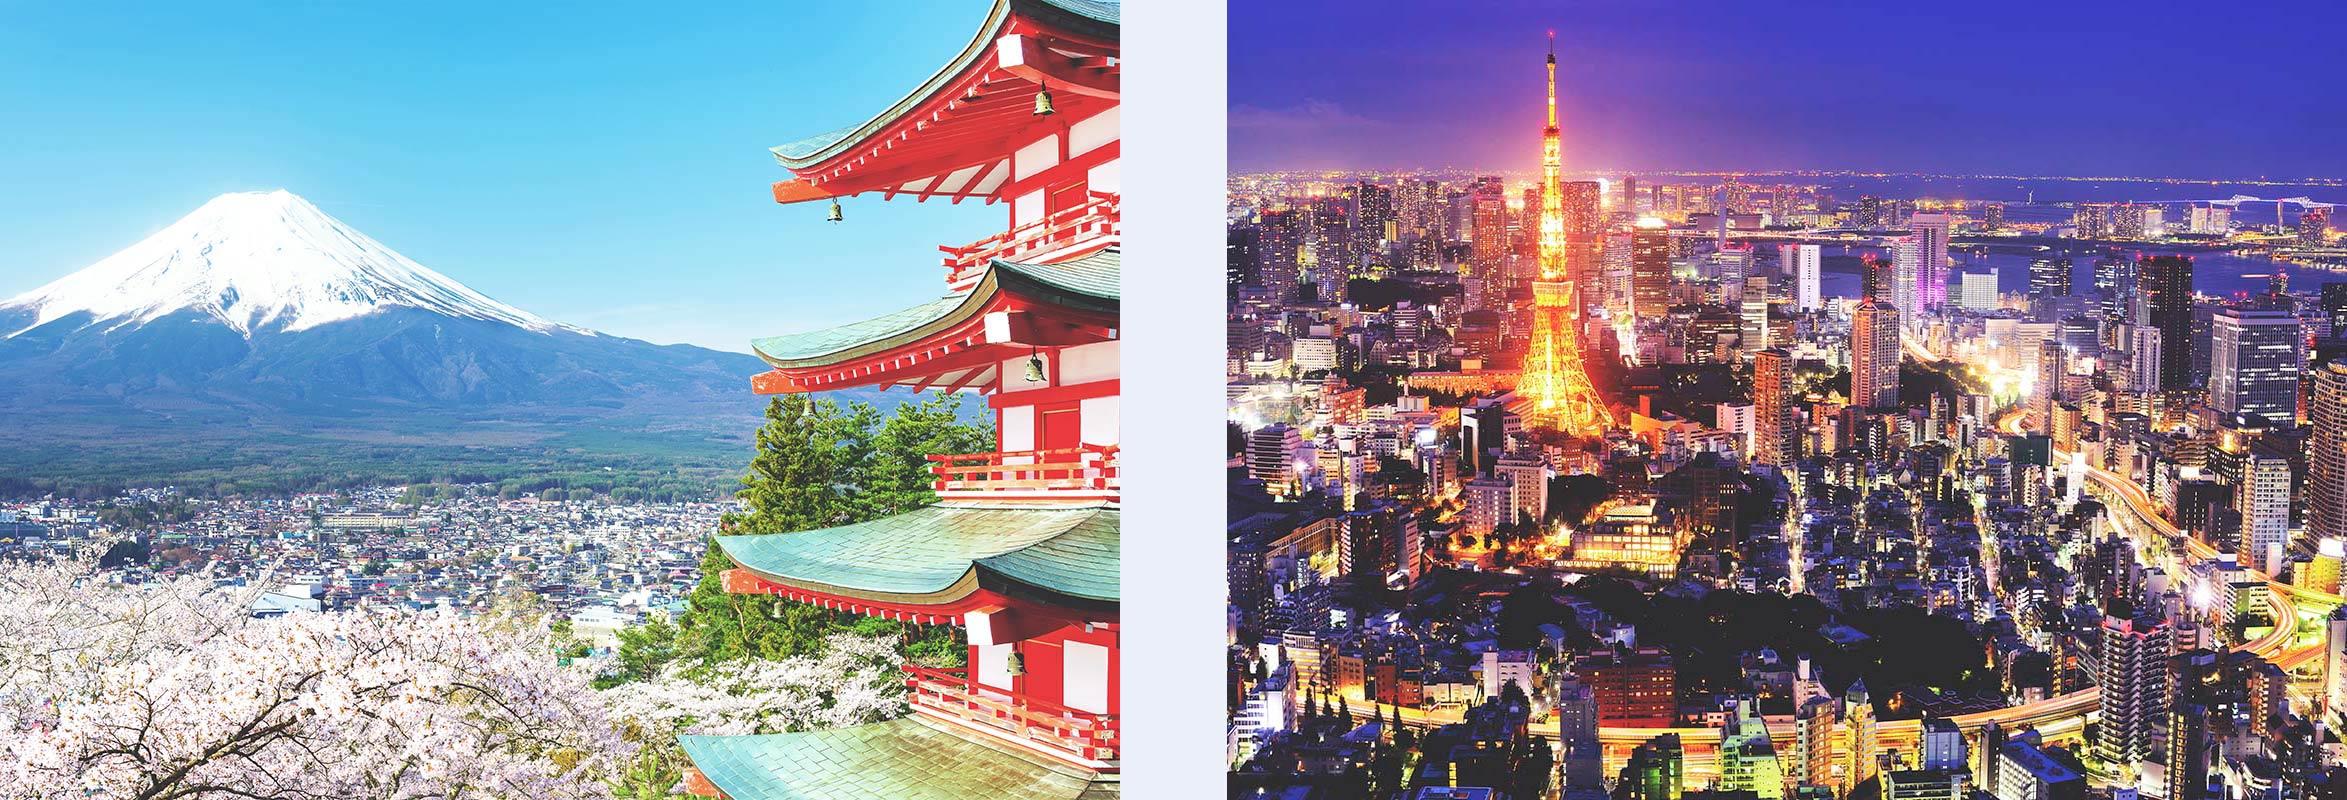 tokyo_japan_thinkstock_123456